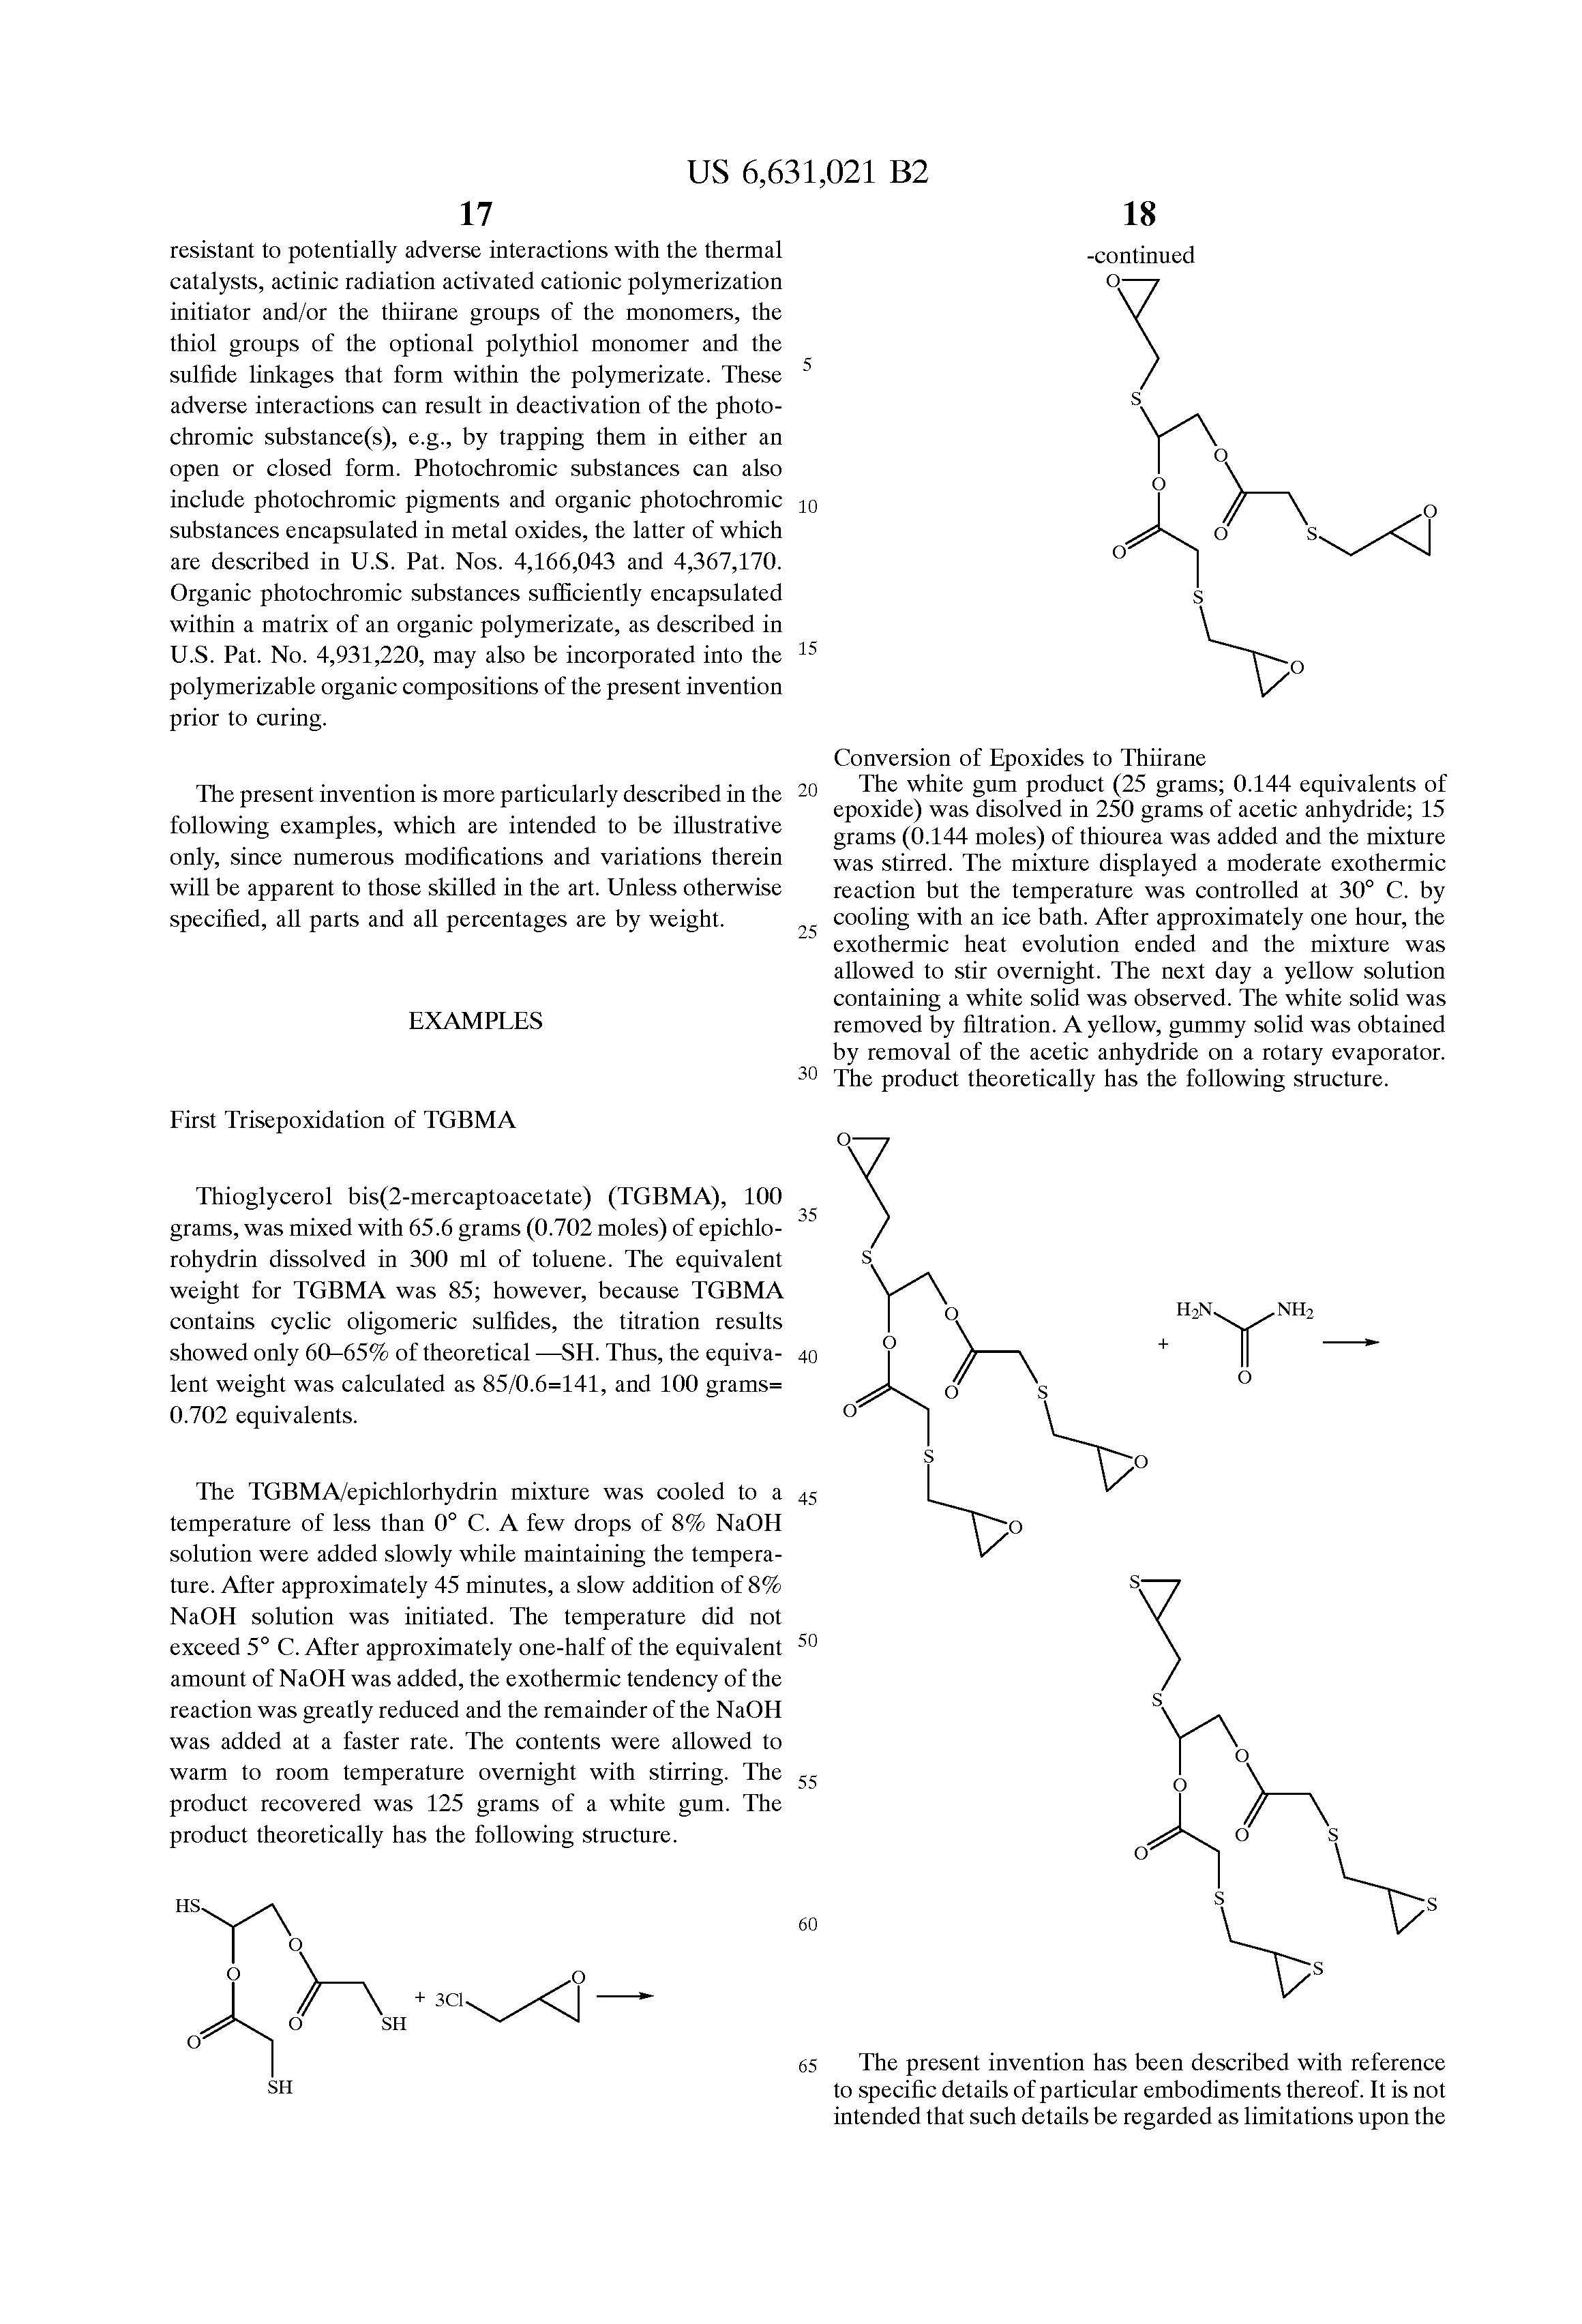 Patent US6631021 - Polyfunctional thiirane compounds ...